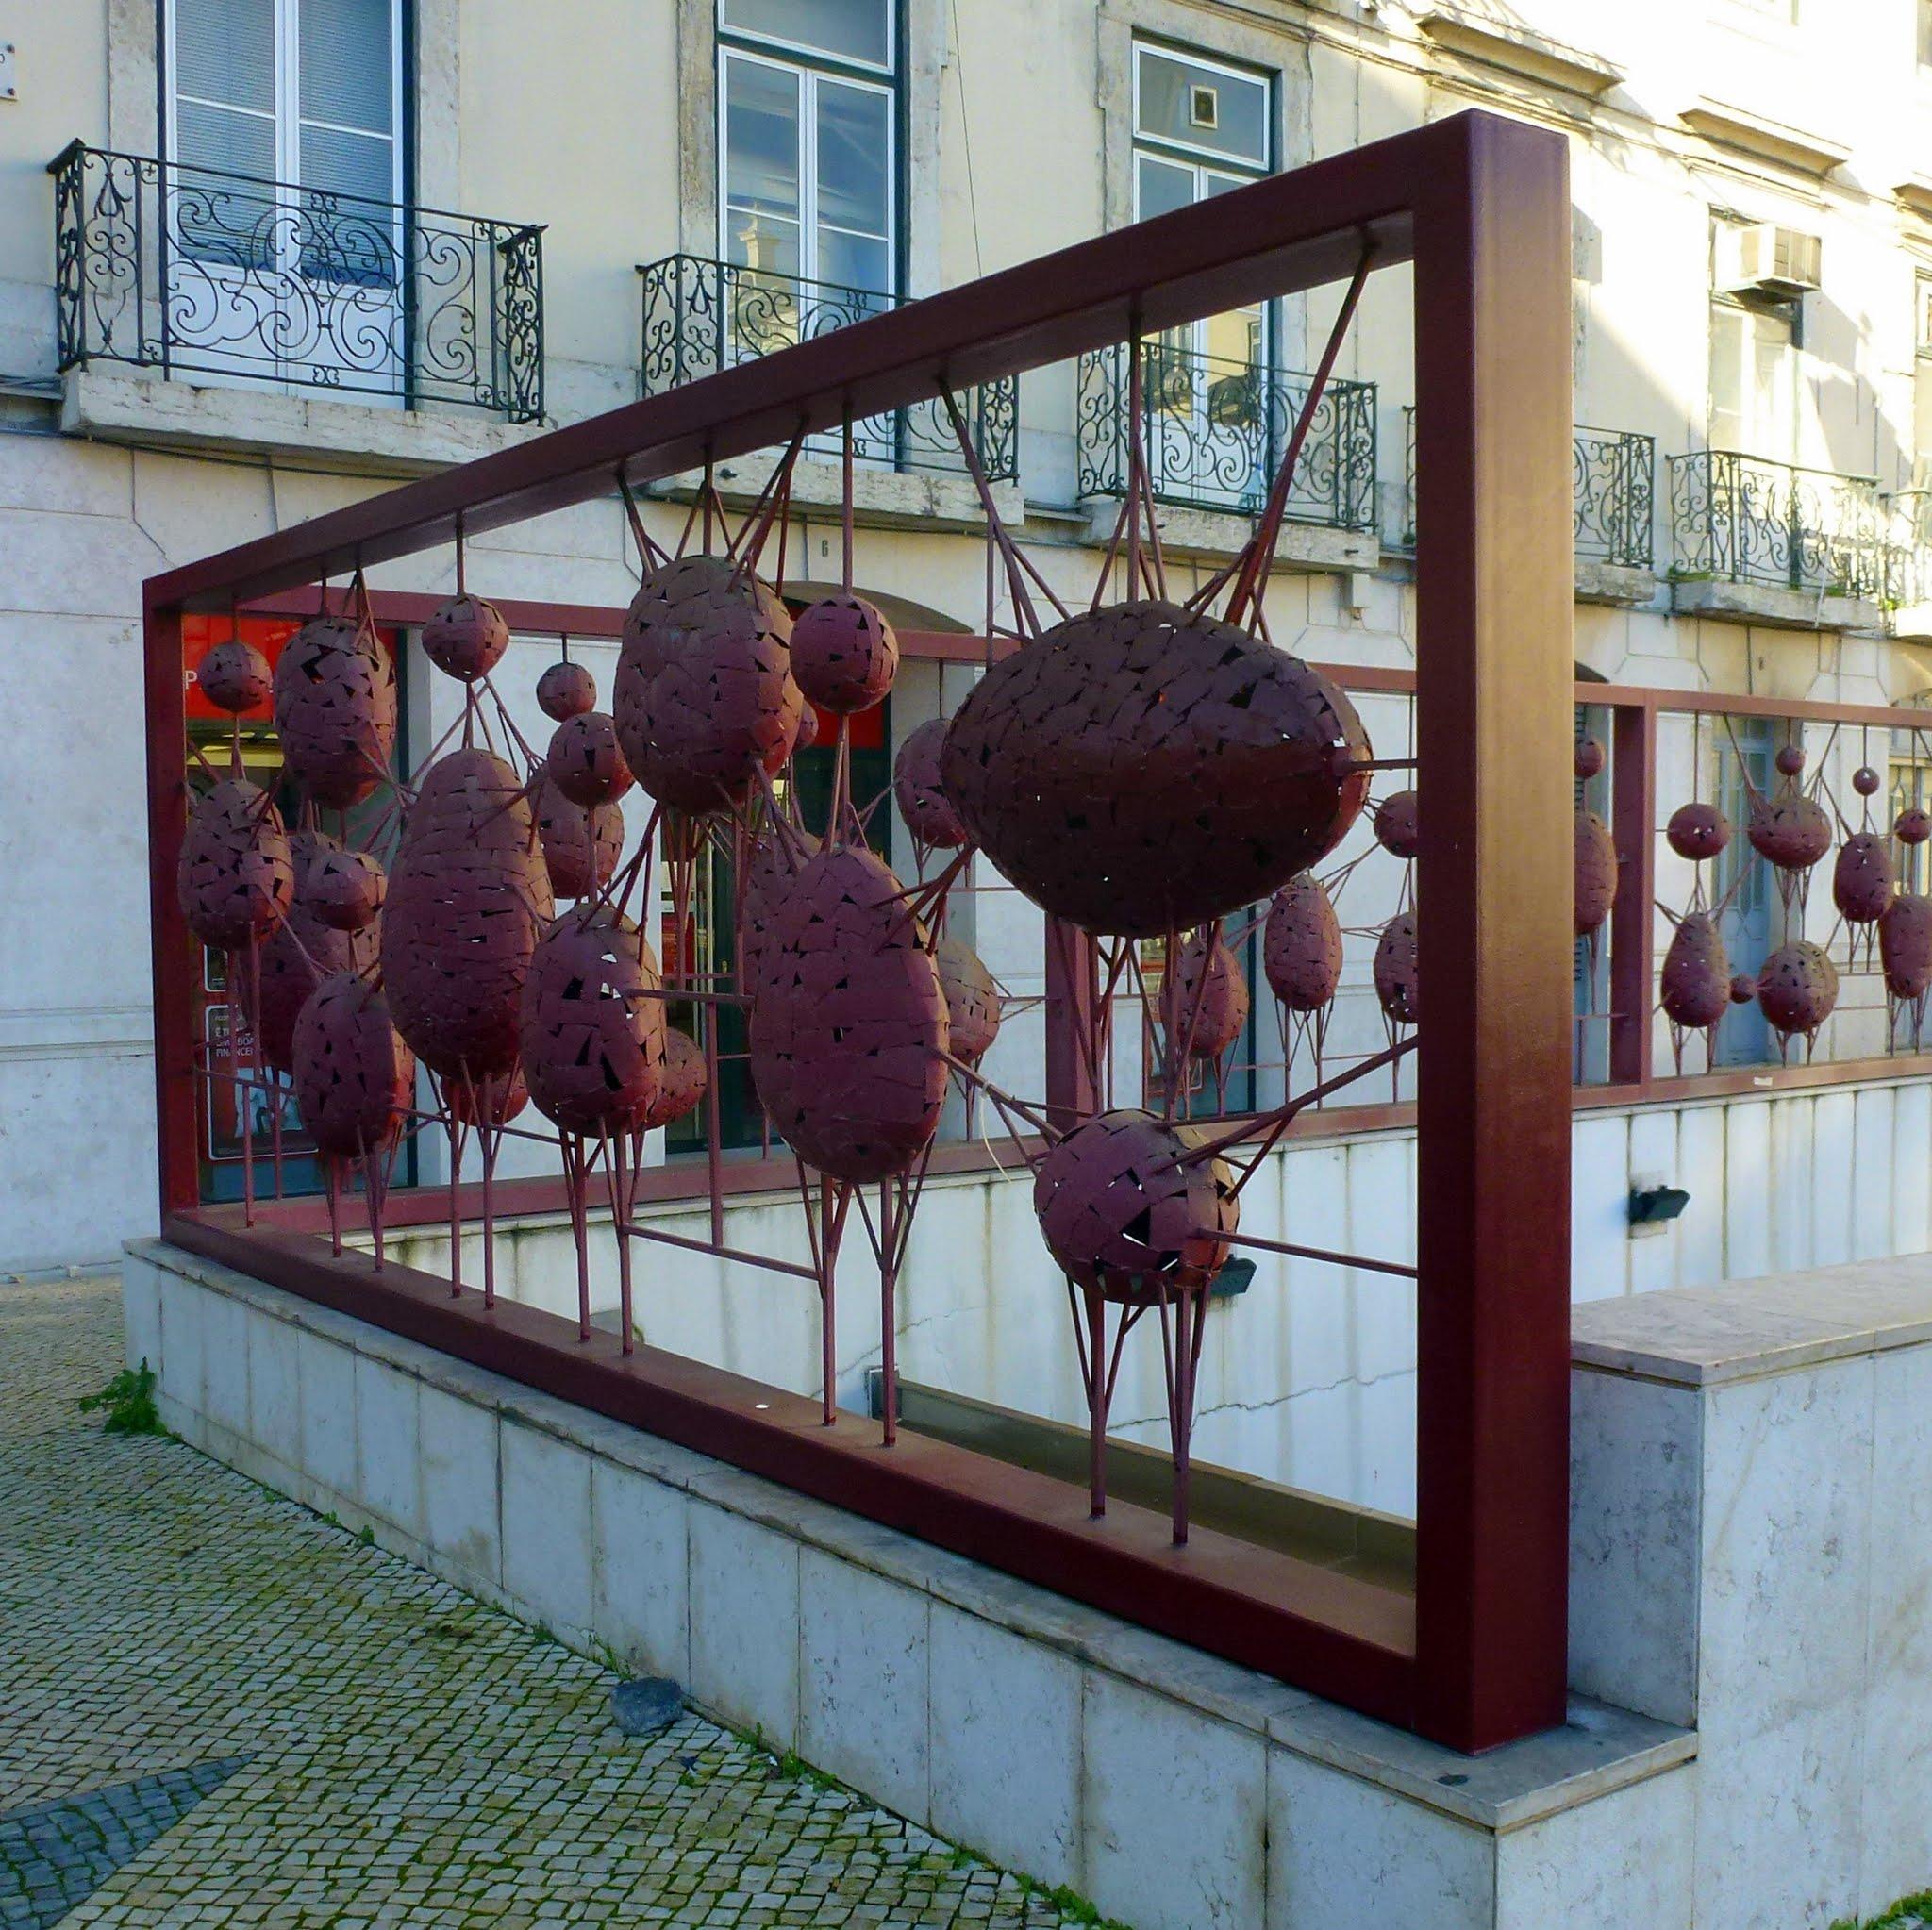 Jorge Vieira da Silva, hek, Lissabon, 1997. Foto Николай Максимович